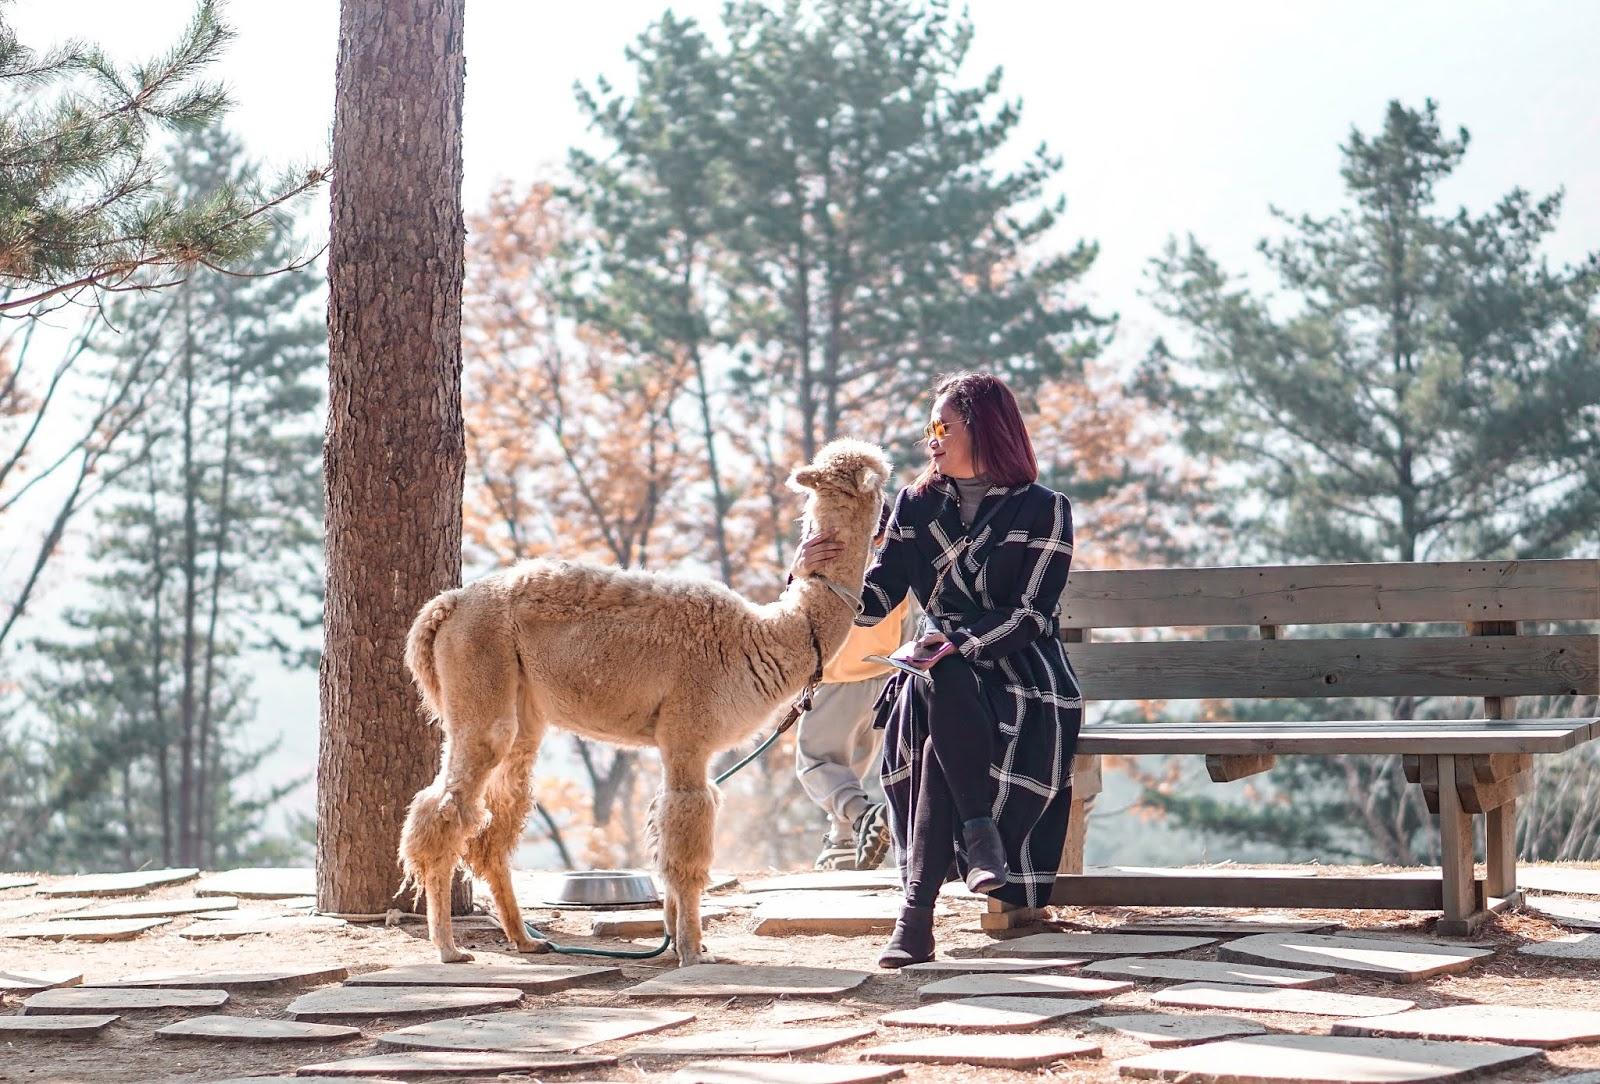 South Korea, AutumnInKorea, TrazyMemories, Alpaca World, Gangwon, what to do in South Korea, Seoul, Asia, abroad, thedailyposhtravels, the daily posh,alpaca farm in Gangwon, Alpaca Farm